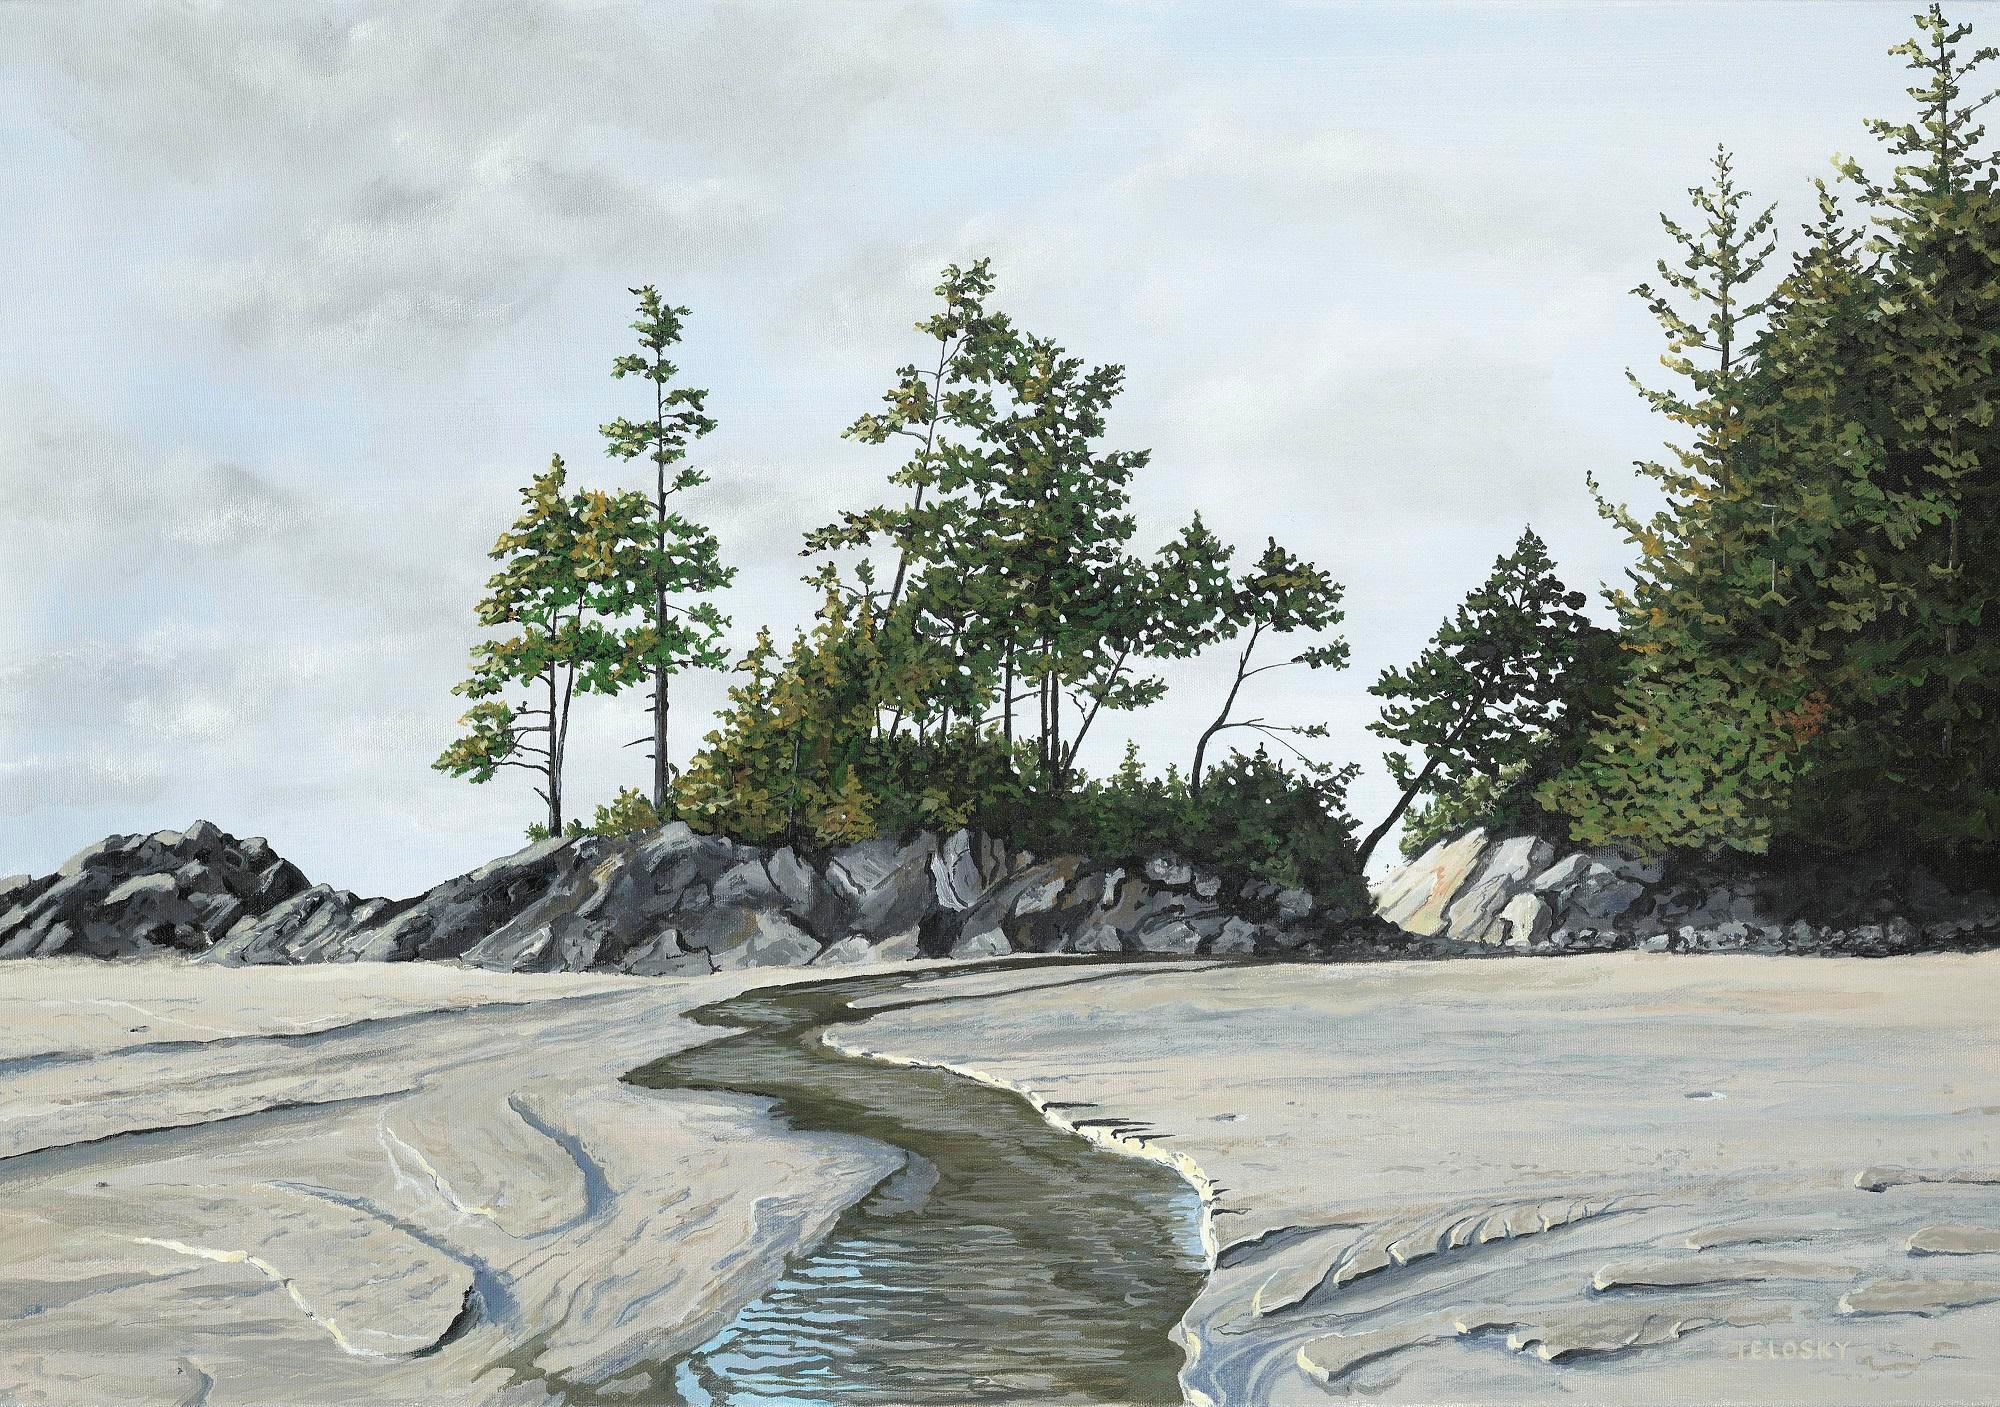 Telosky, Dan - Tonquin Beach Sand and Creek